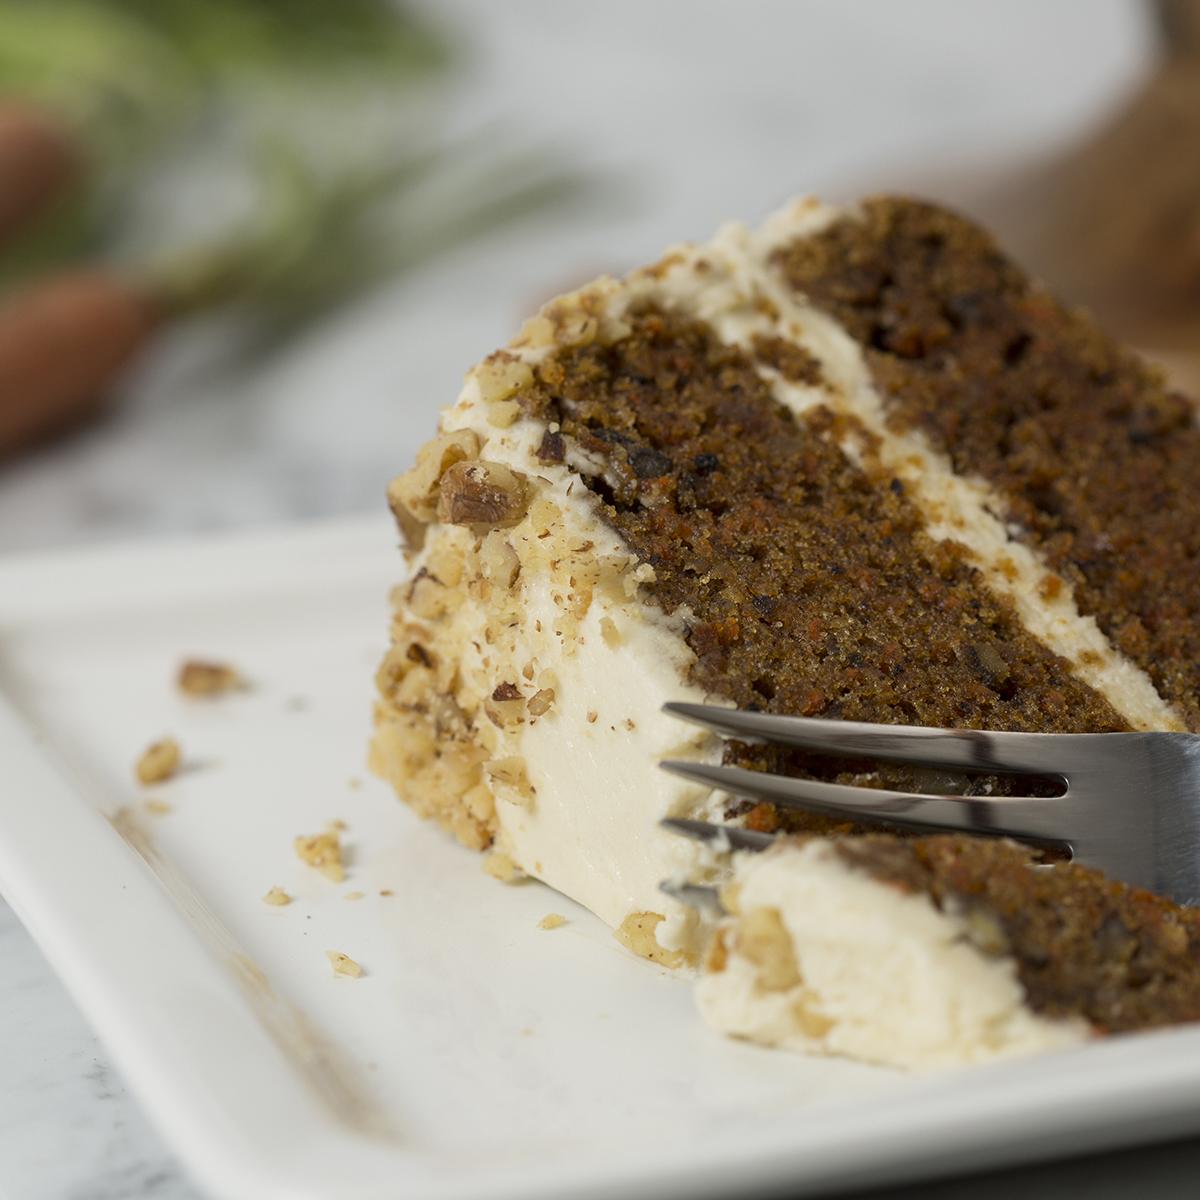 Native Sun's Famous Gluten-Free Carrot Cake